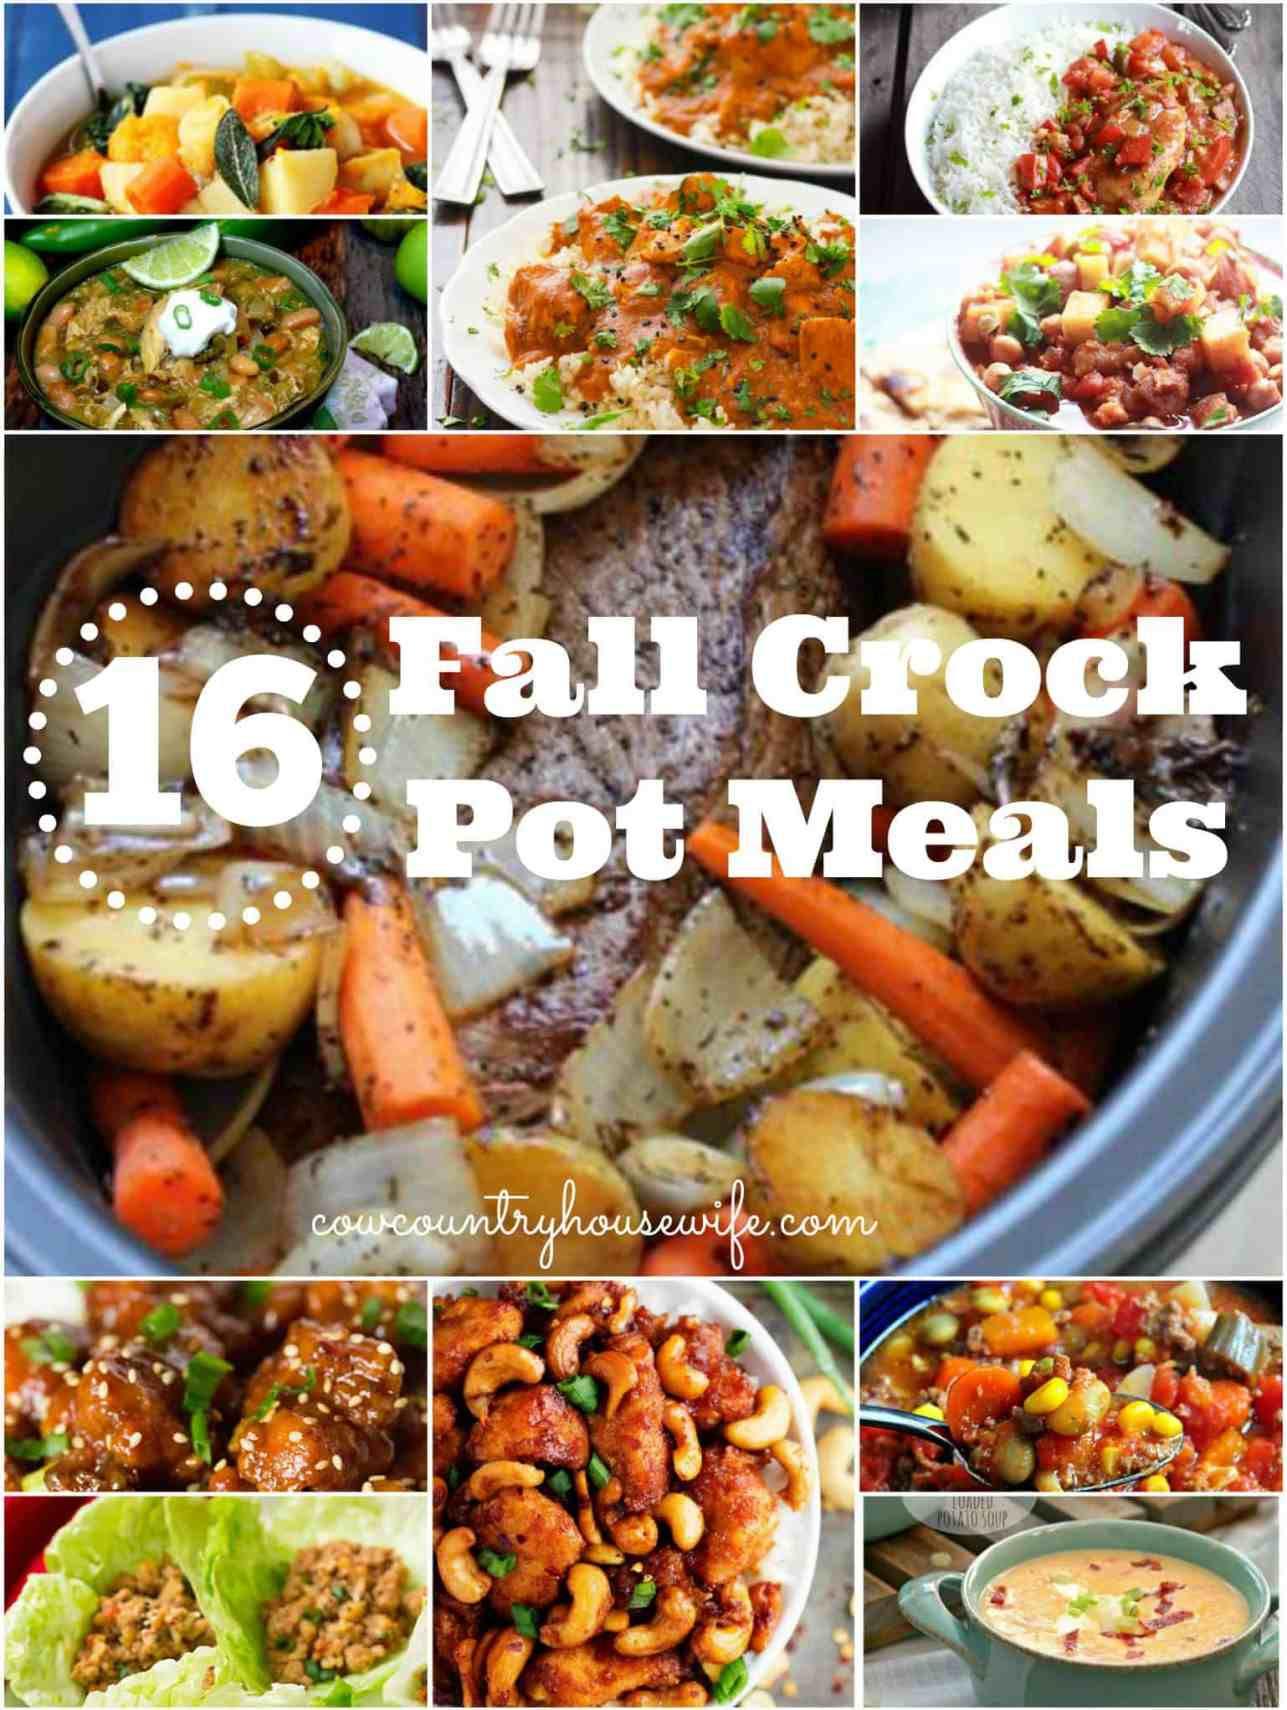 16 Fall Crockpot Meals